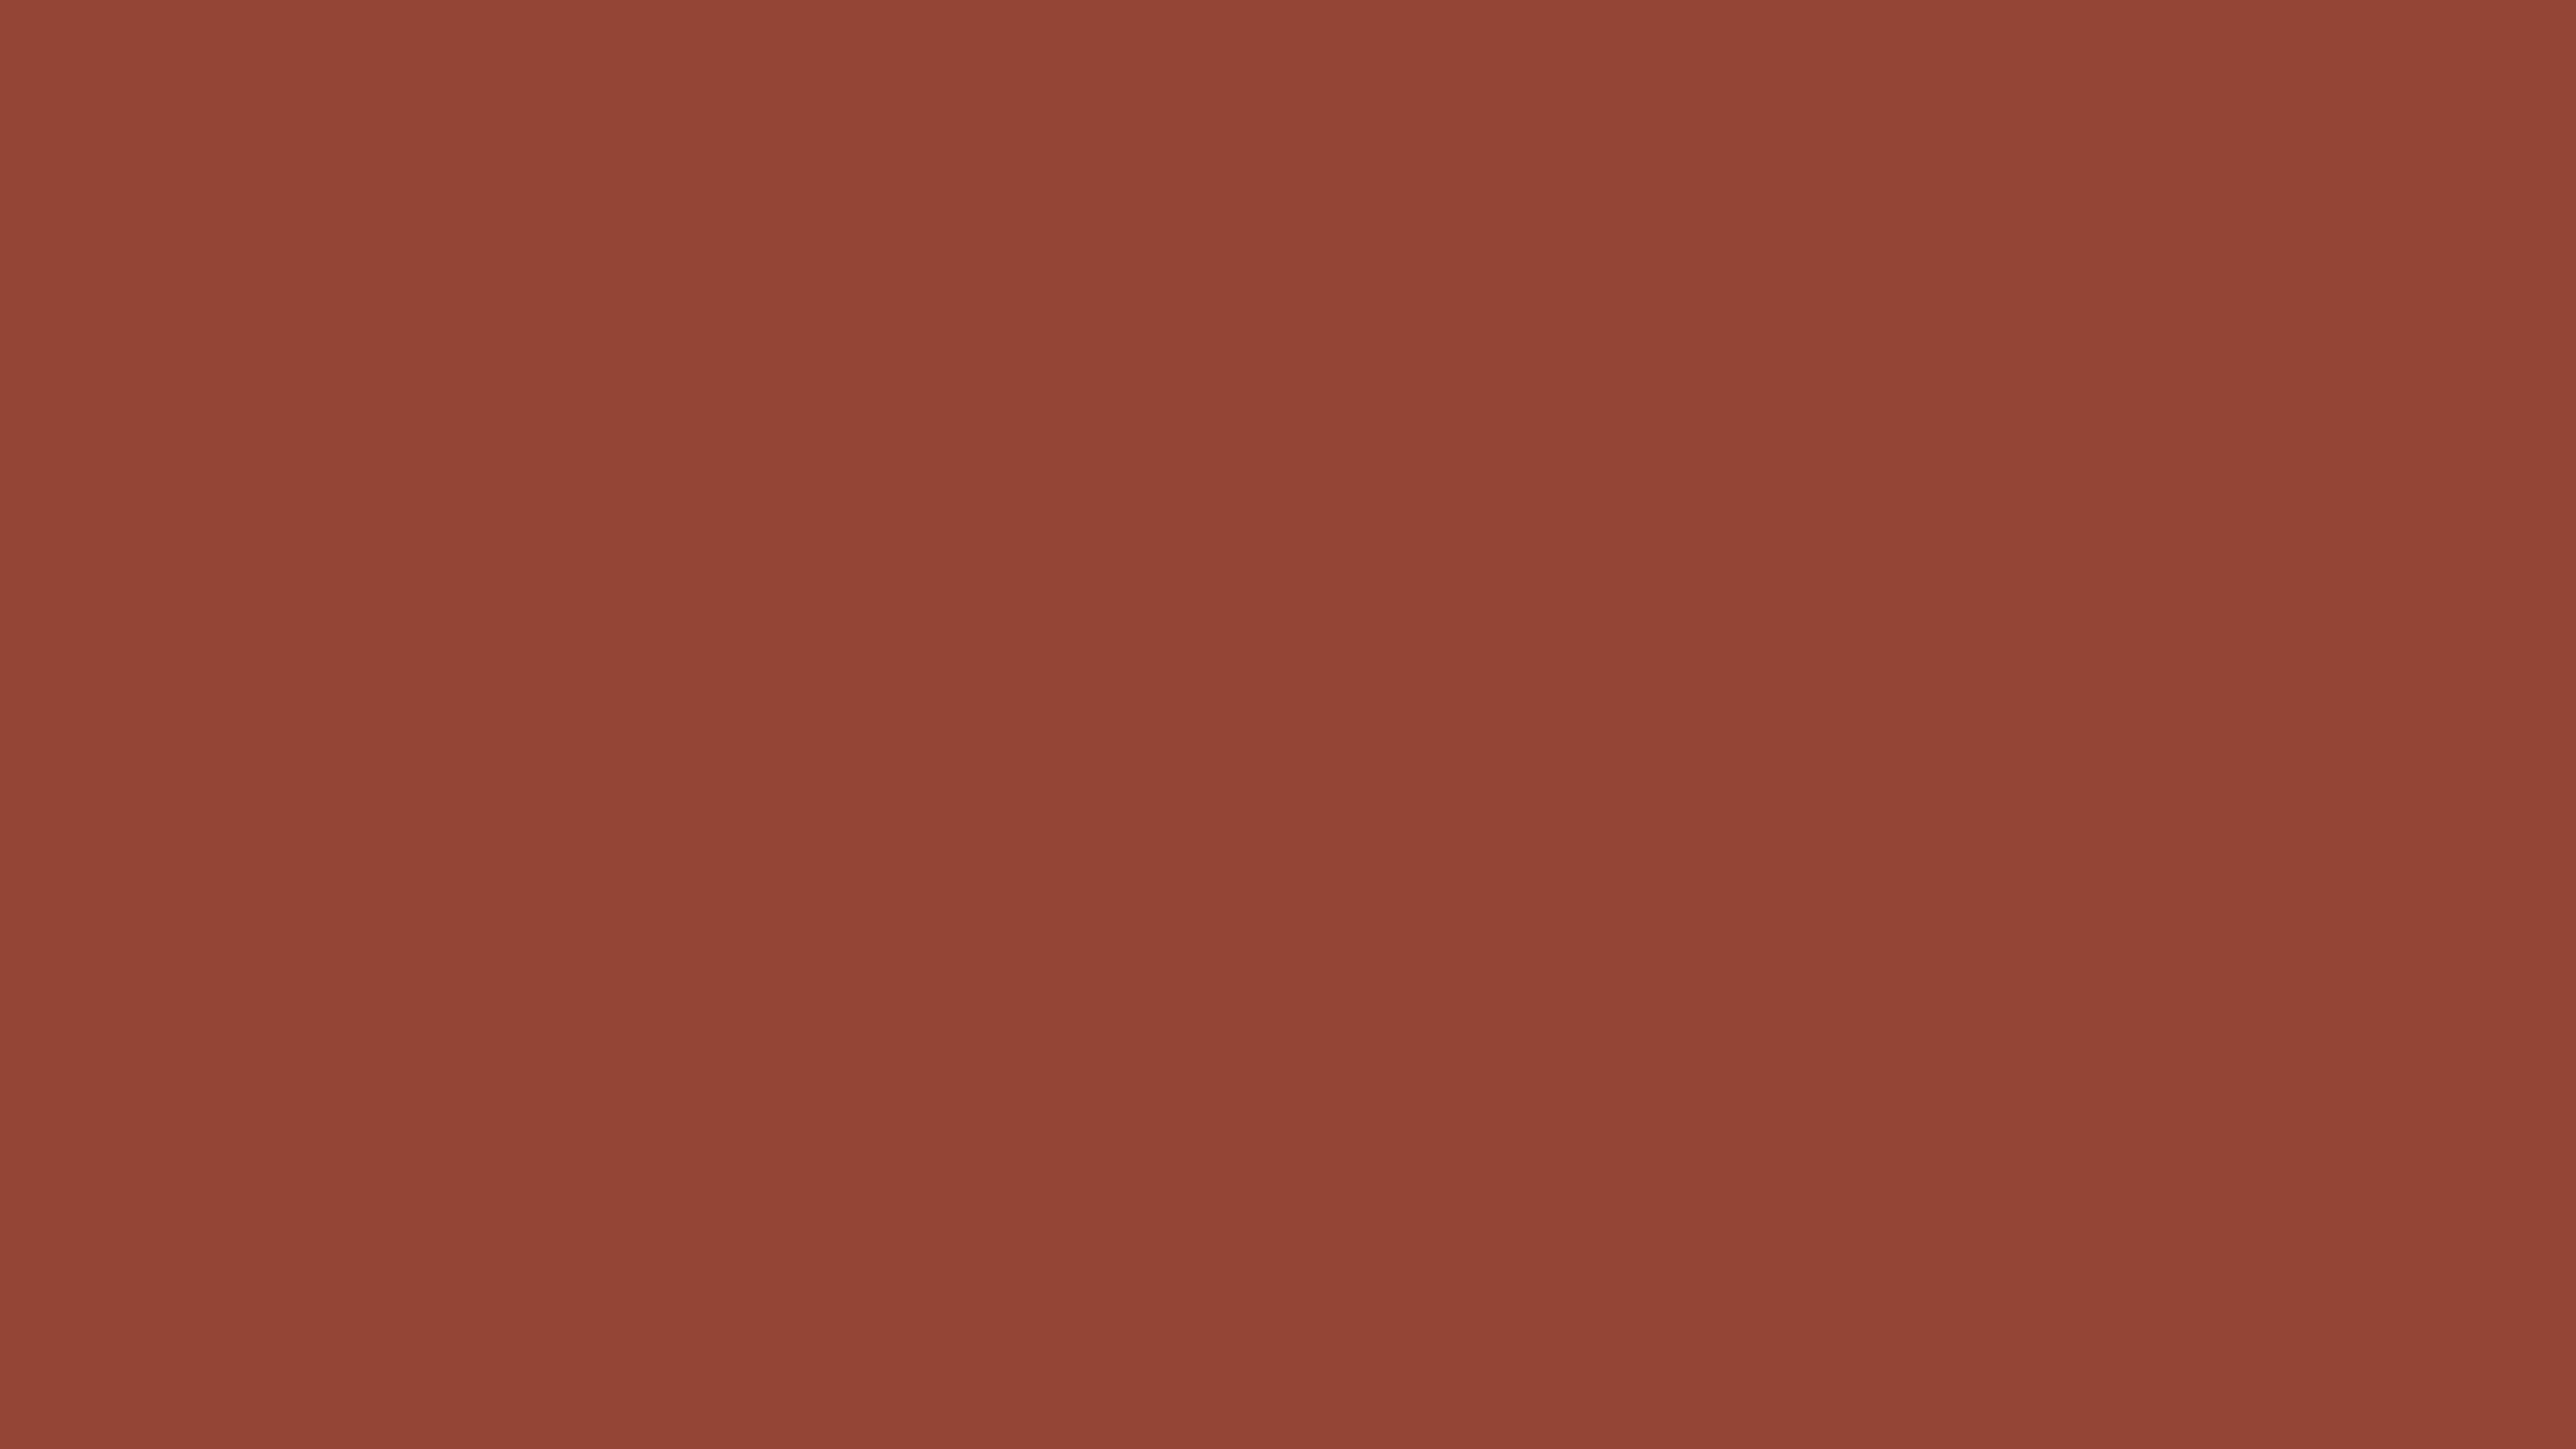 3840x2160 Chestnut Solid Color Background